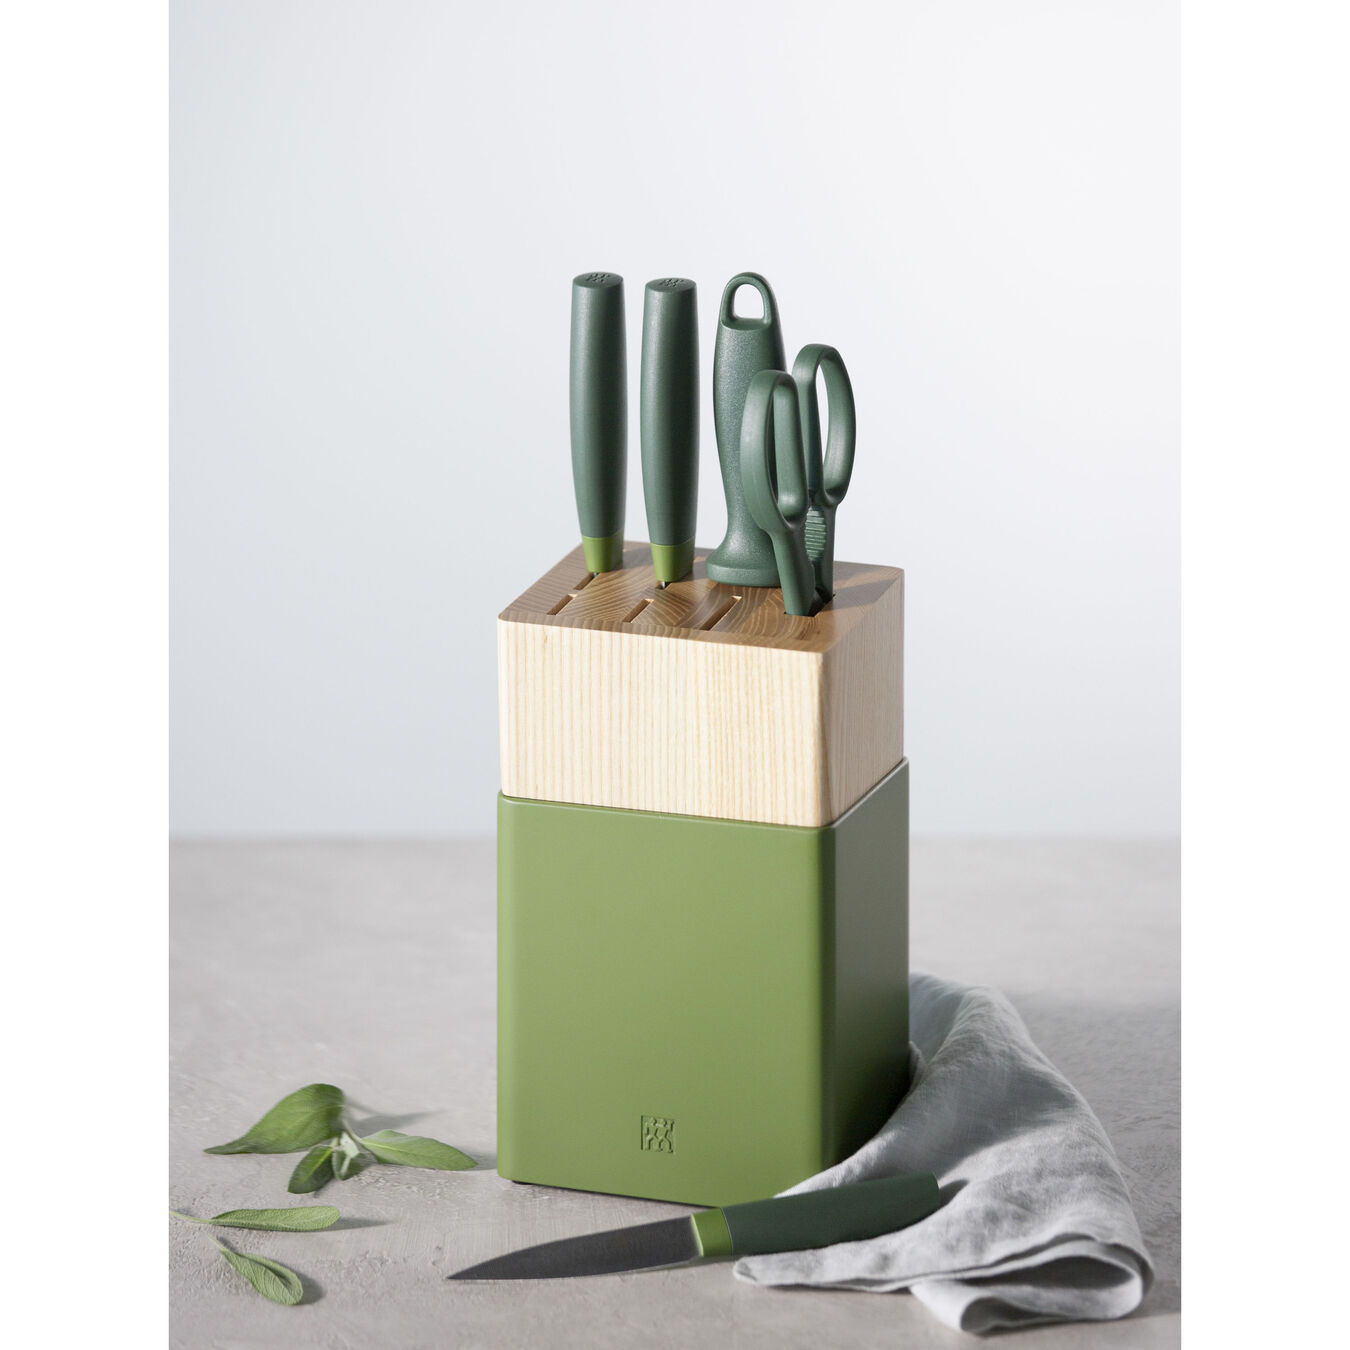 6-pc Knife Block Set - Lime Green,,large 4